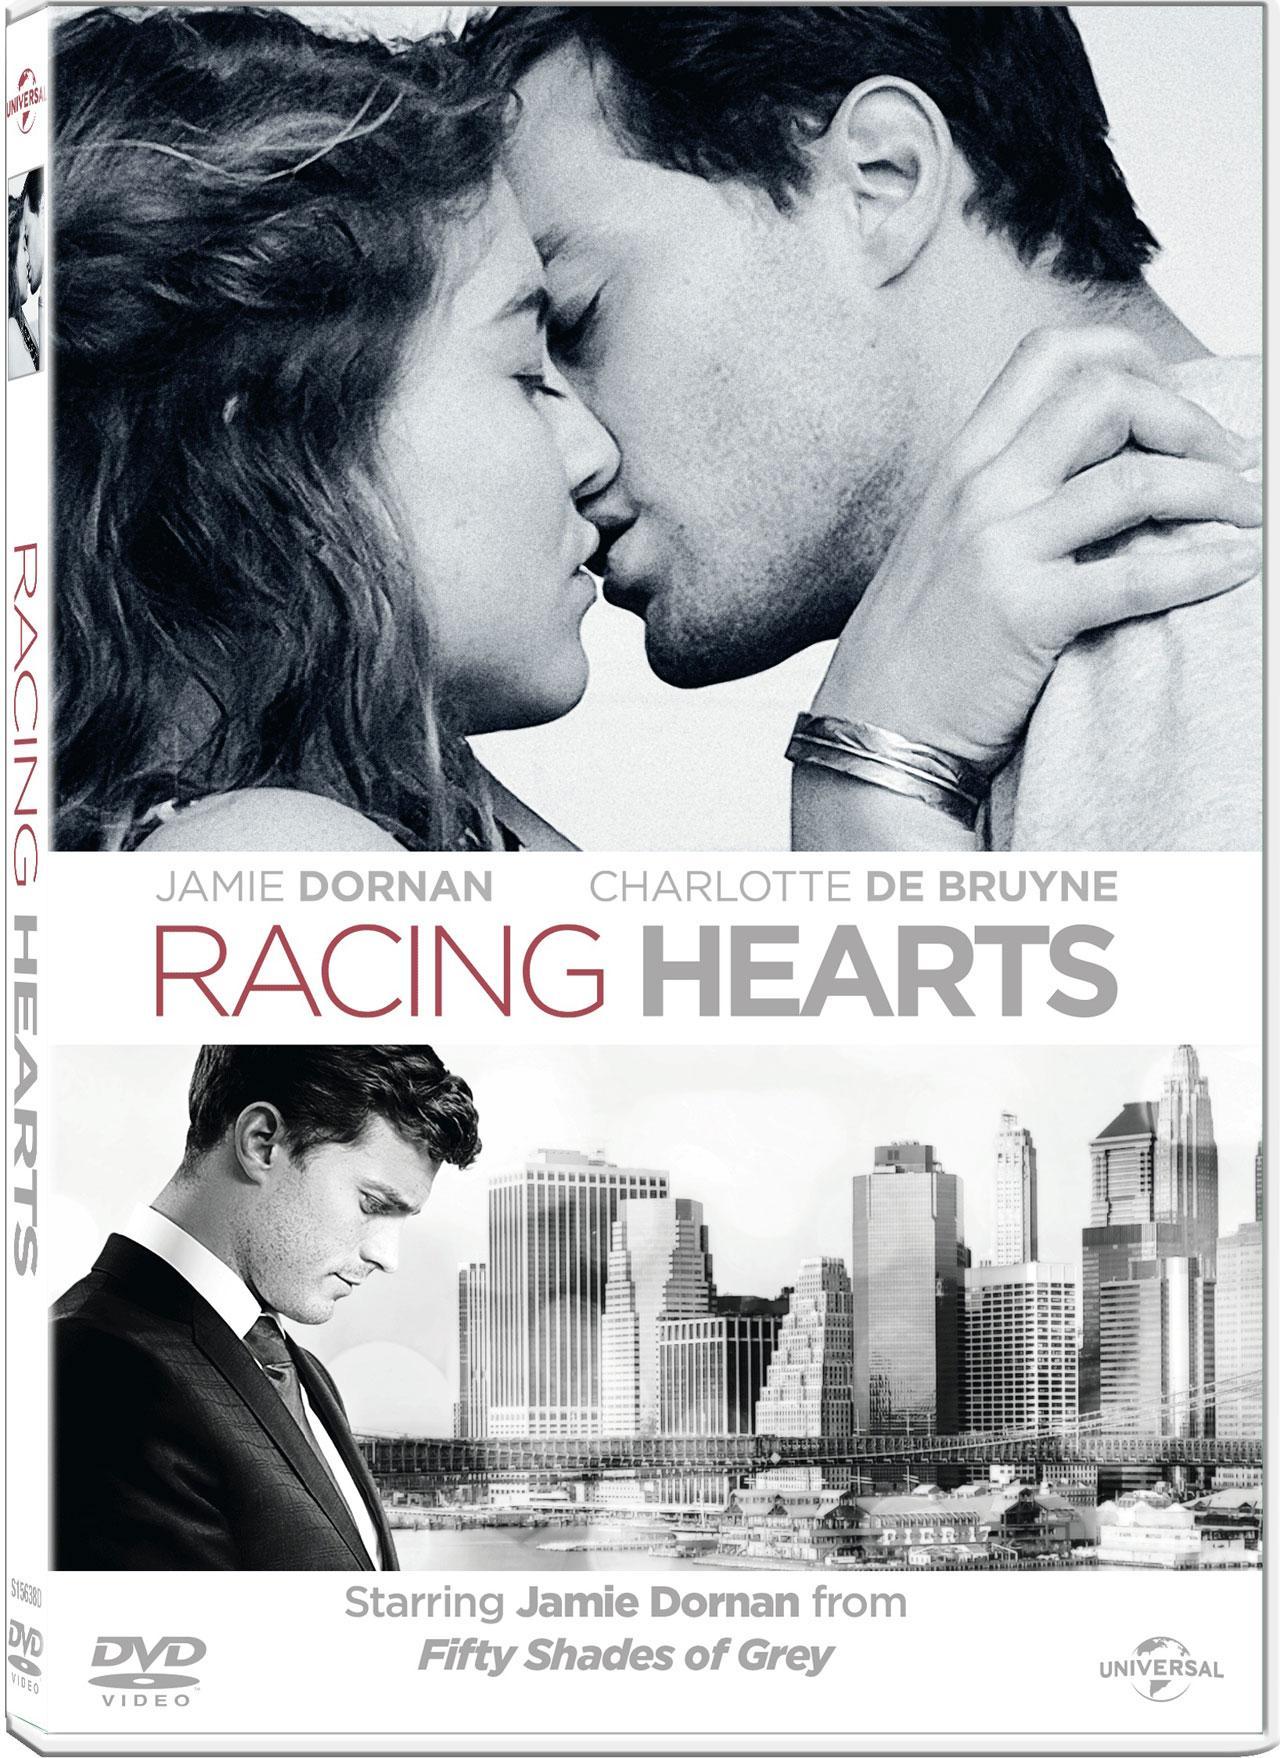 Racing Hearts : ข้ามขอบฟ้า ตามหารัก